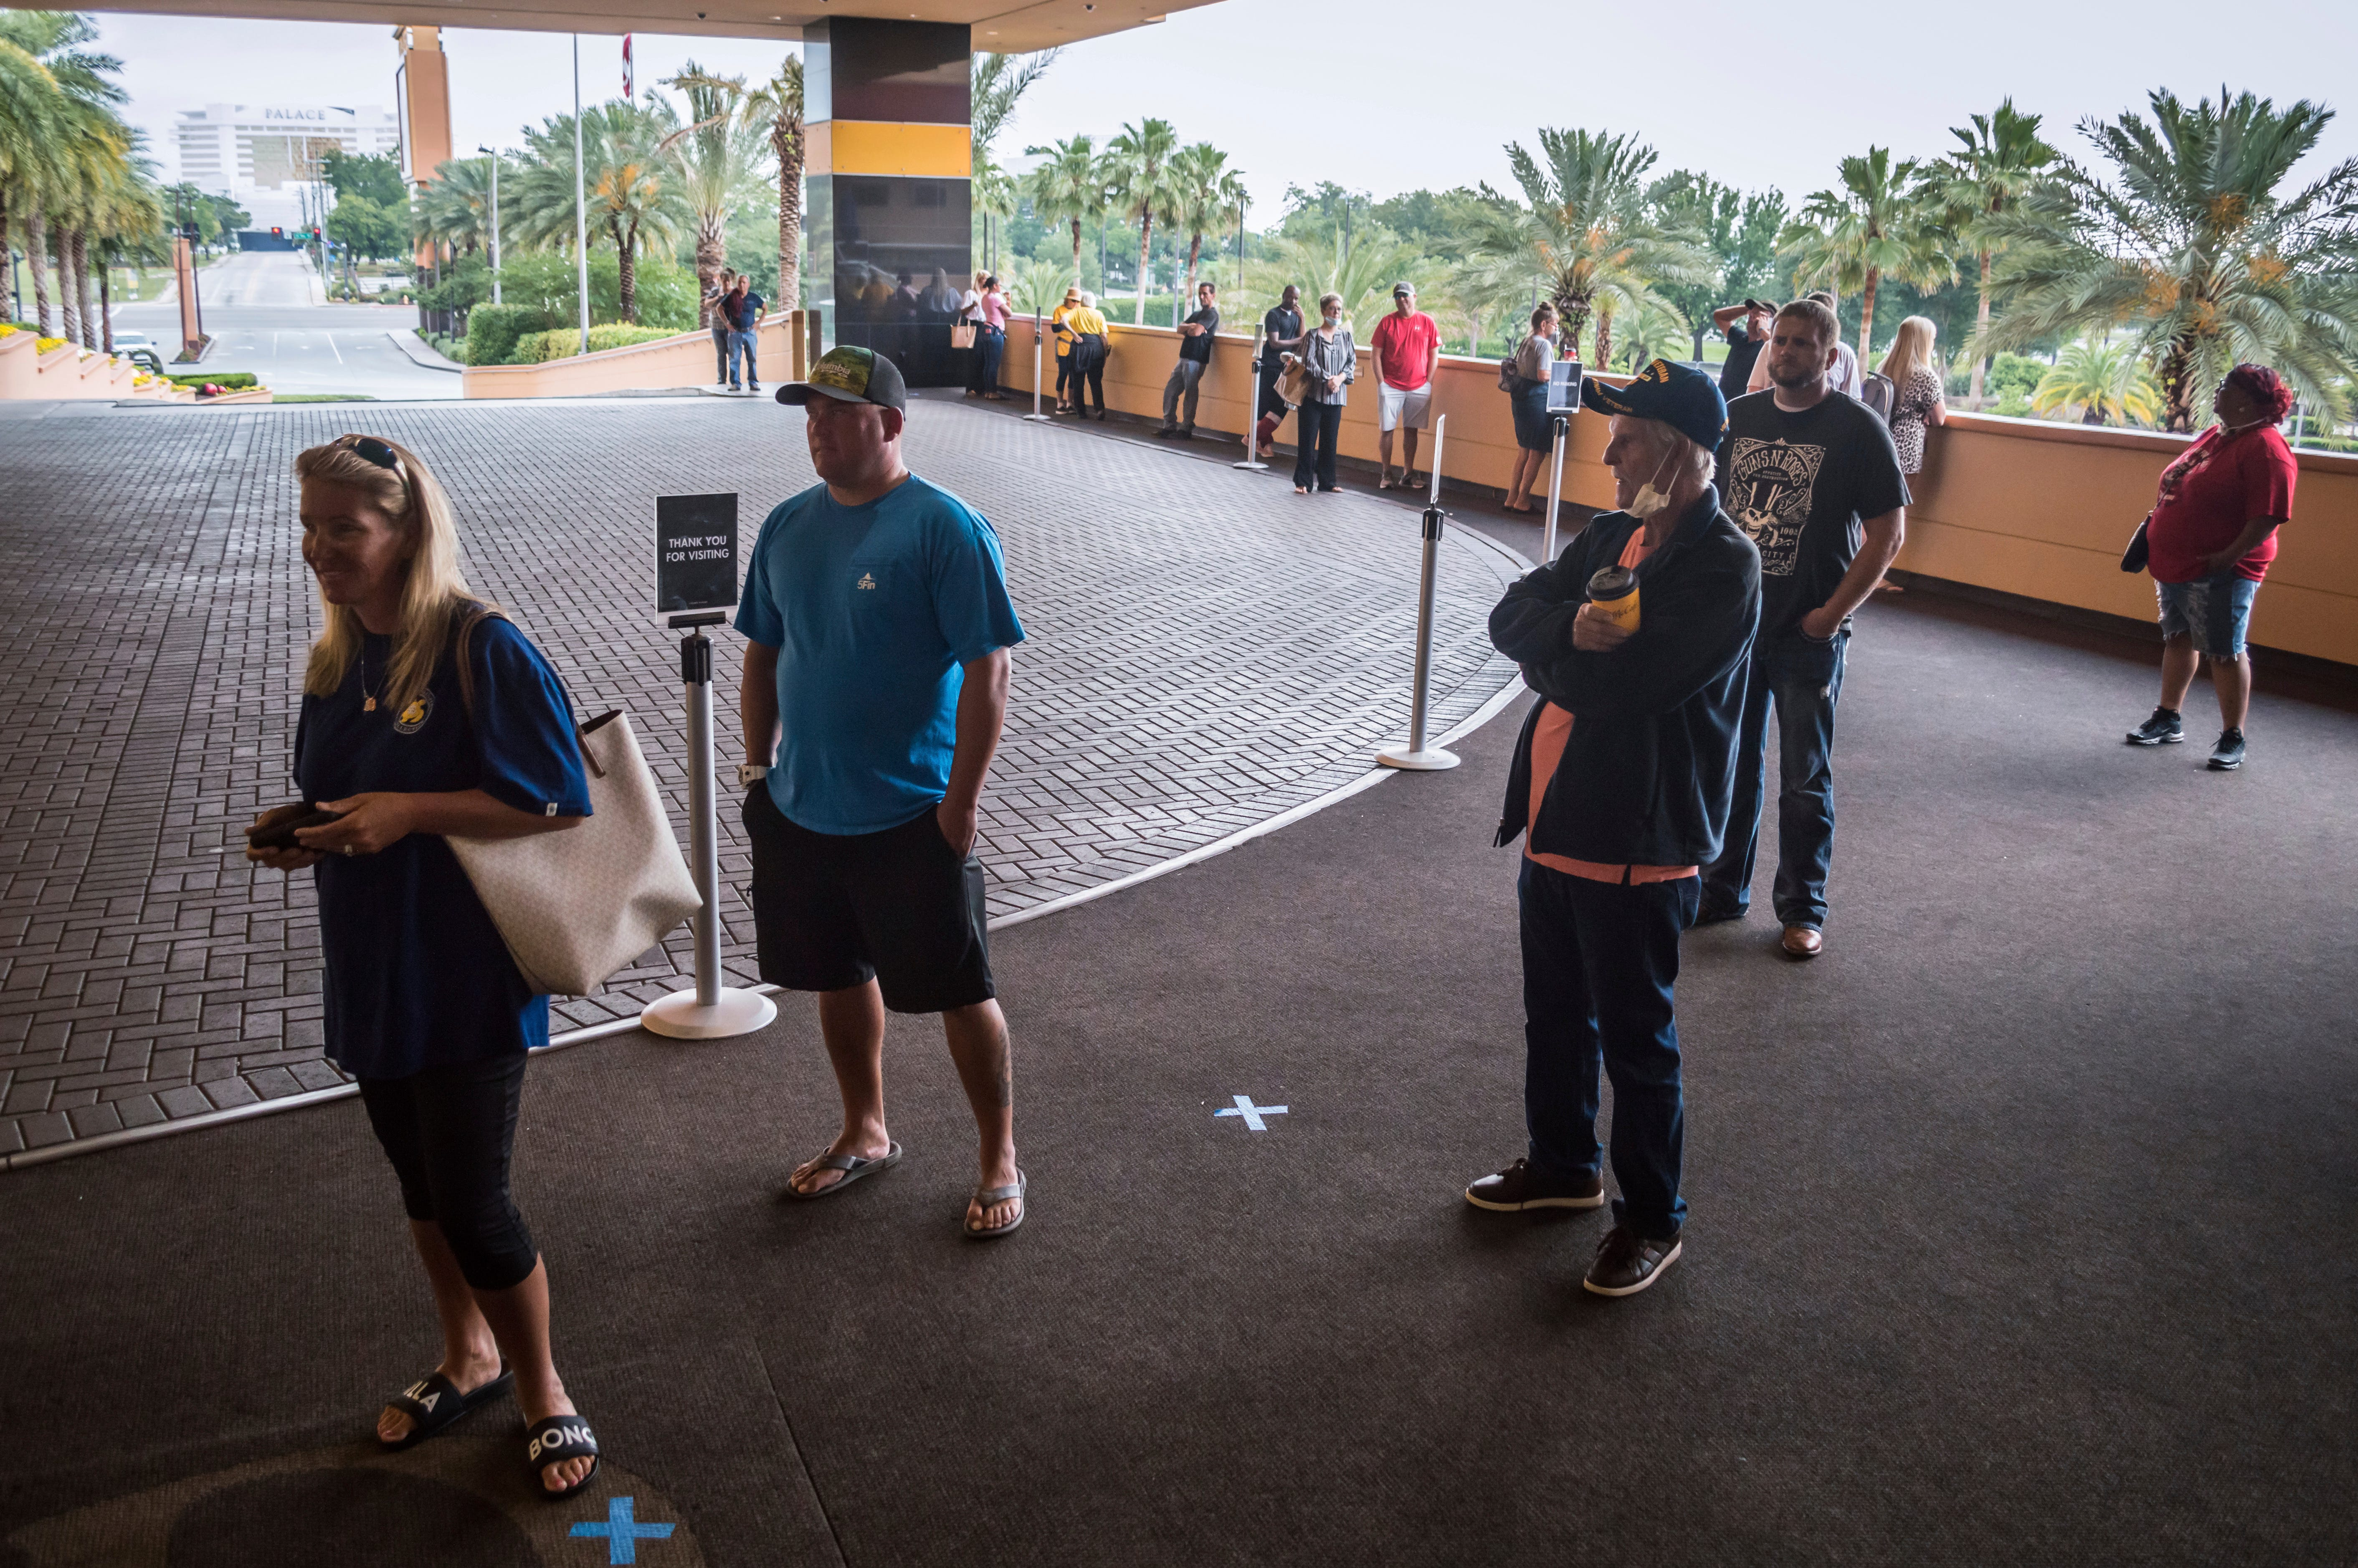 Coronavirus Mississippi Sees Tourists As Margaritaville More Open